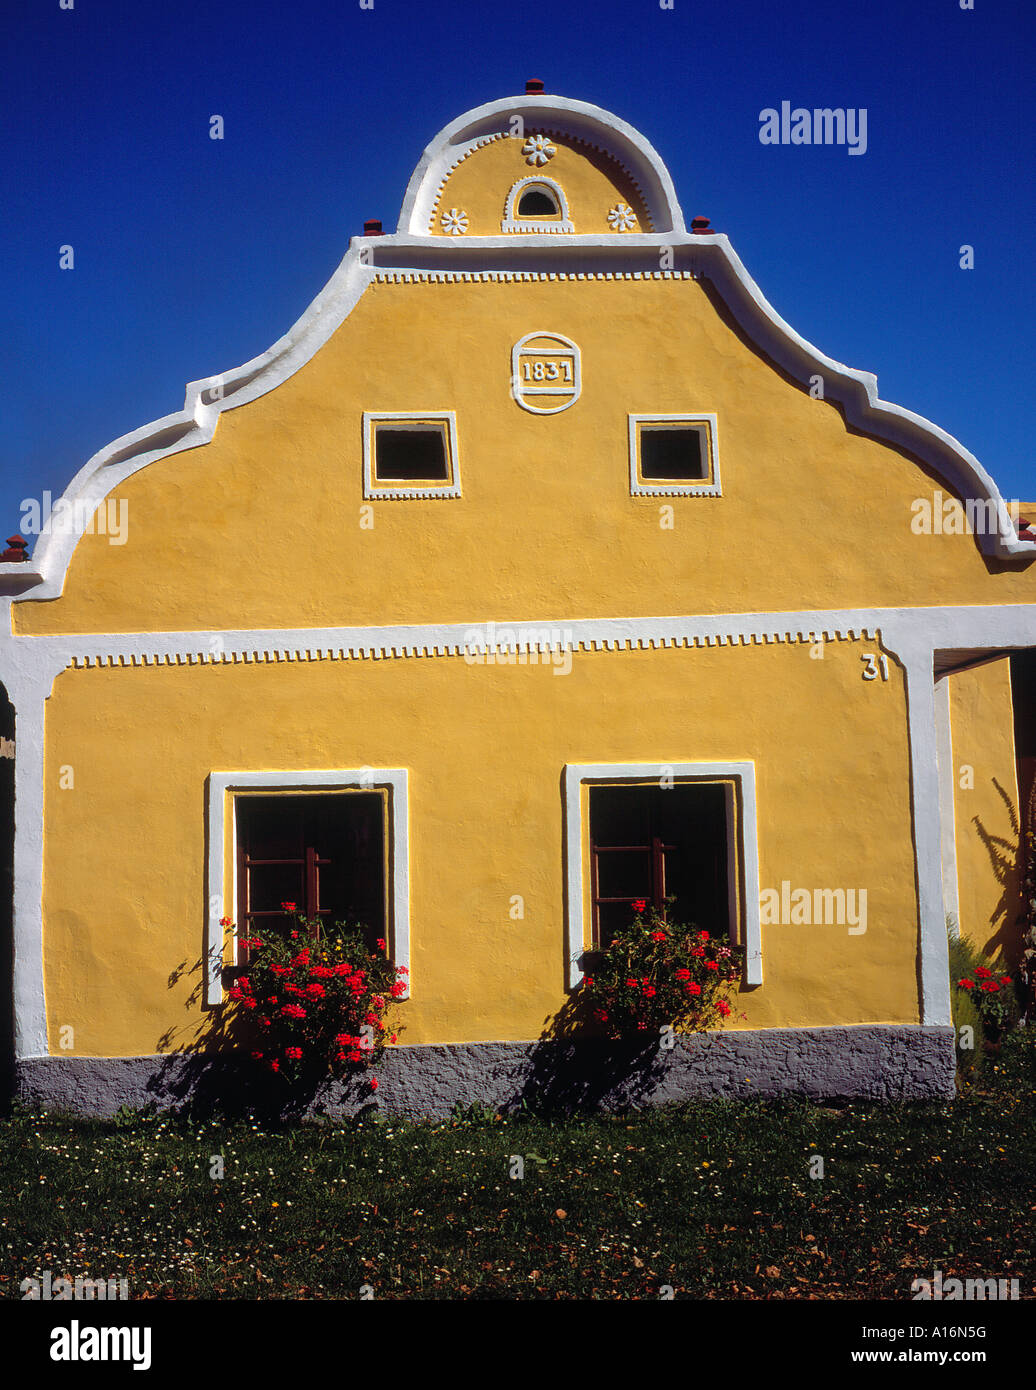 historical  village of  Holasovice Ceske Budejovice Czech Republic, Europe. Photo by Willy Matheisl - Stock Image